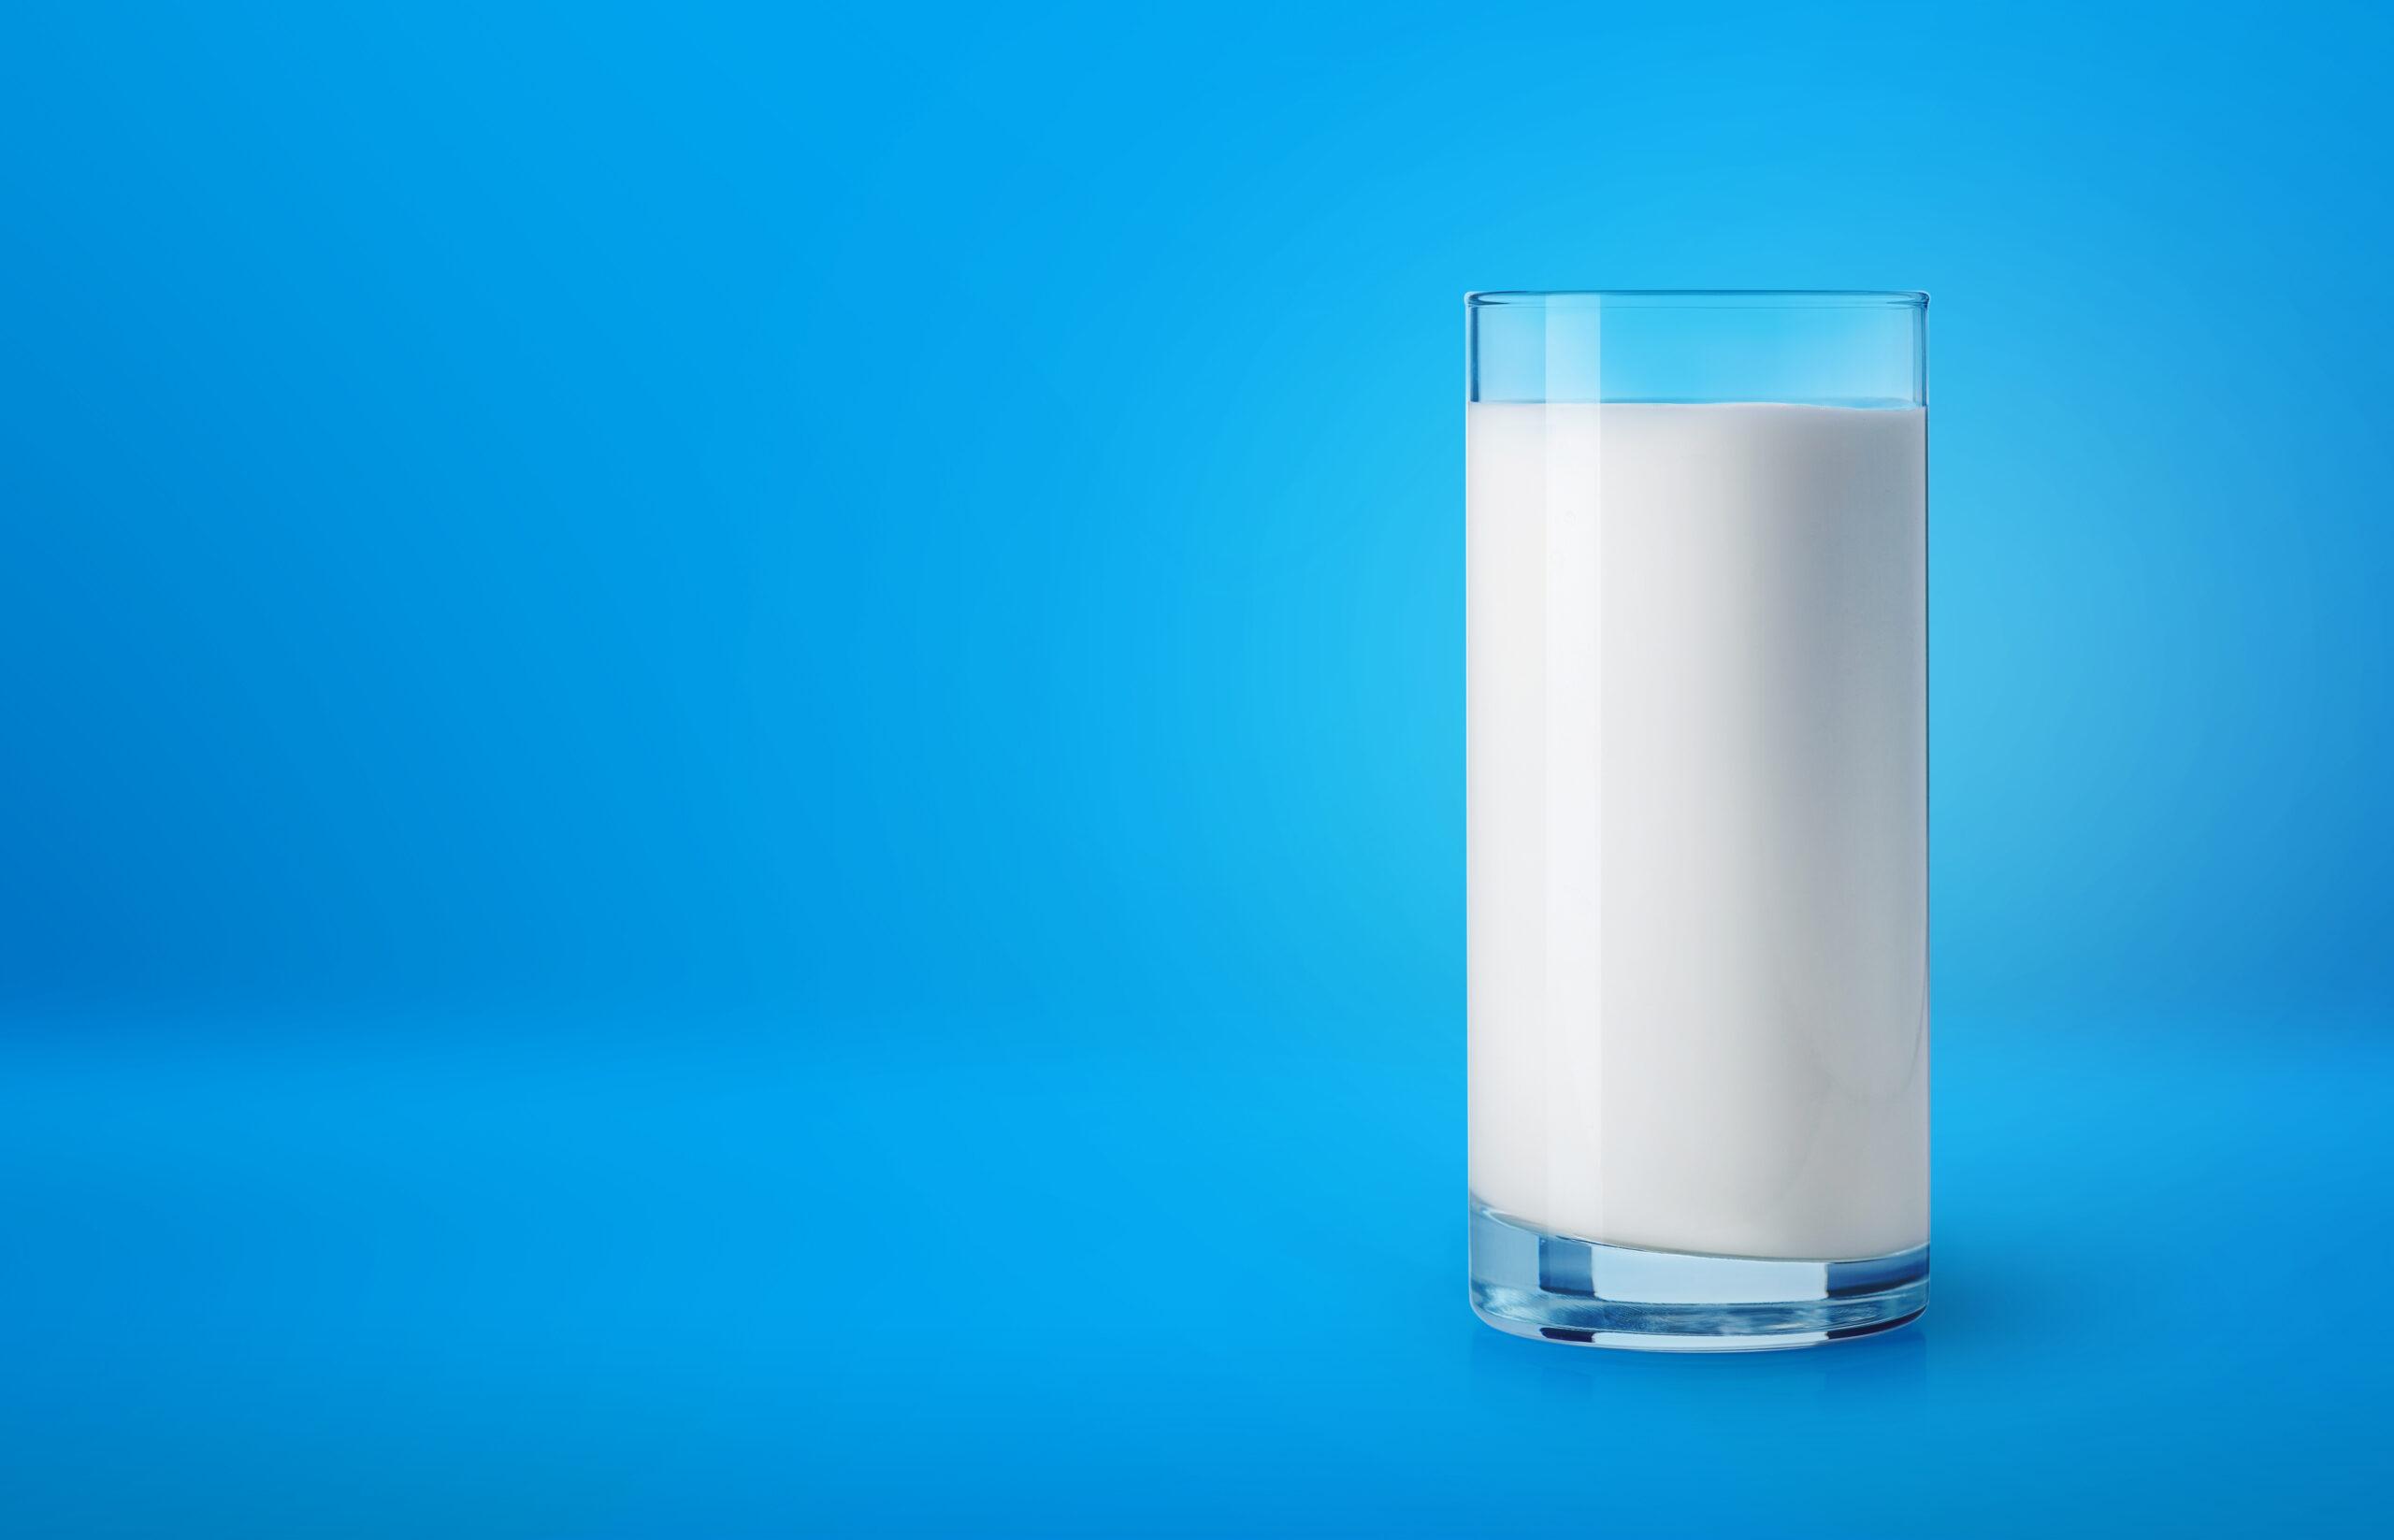 Glass of fresh milk on blue background